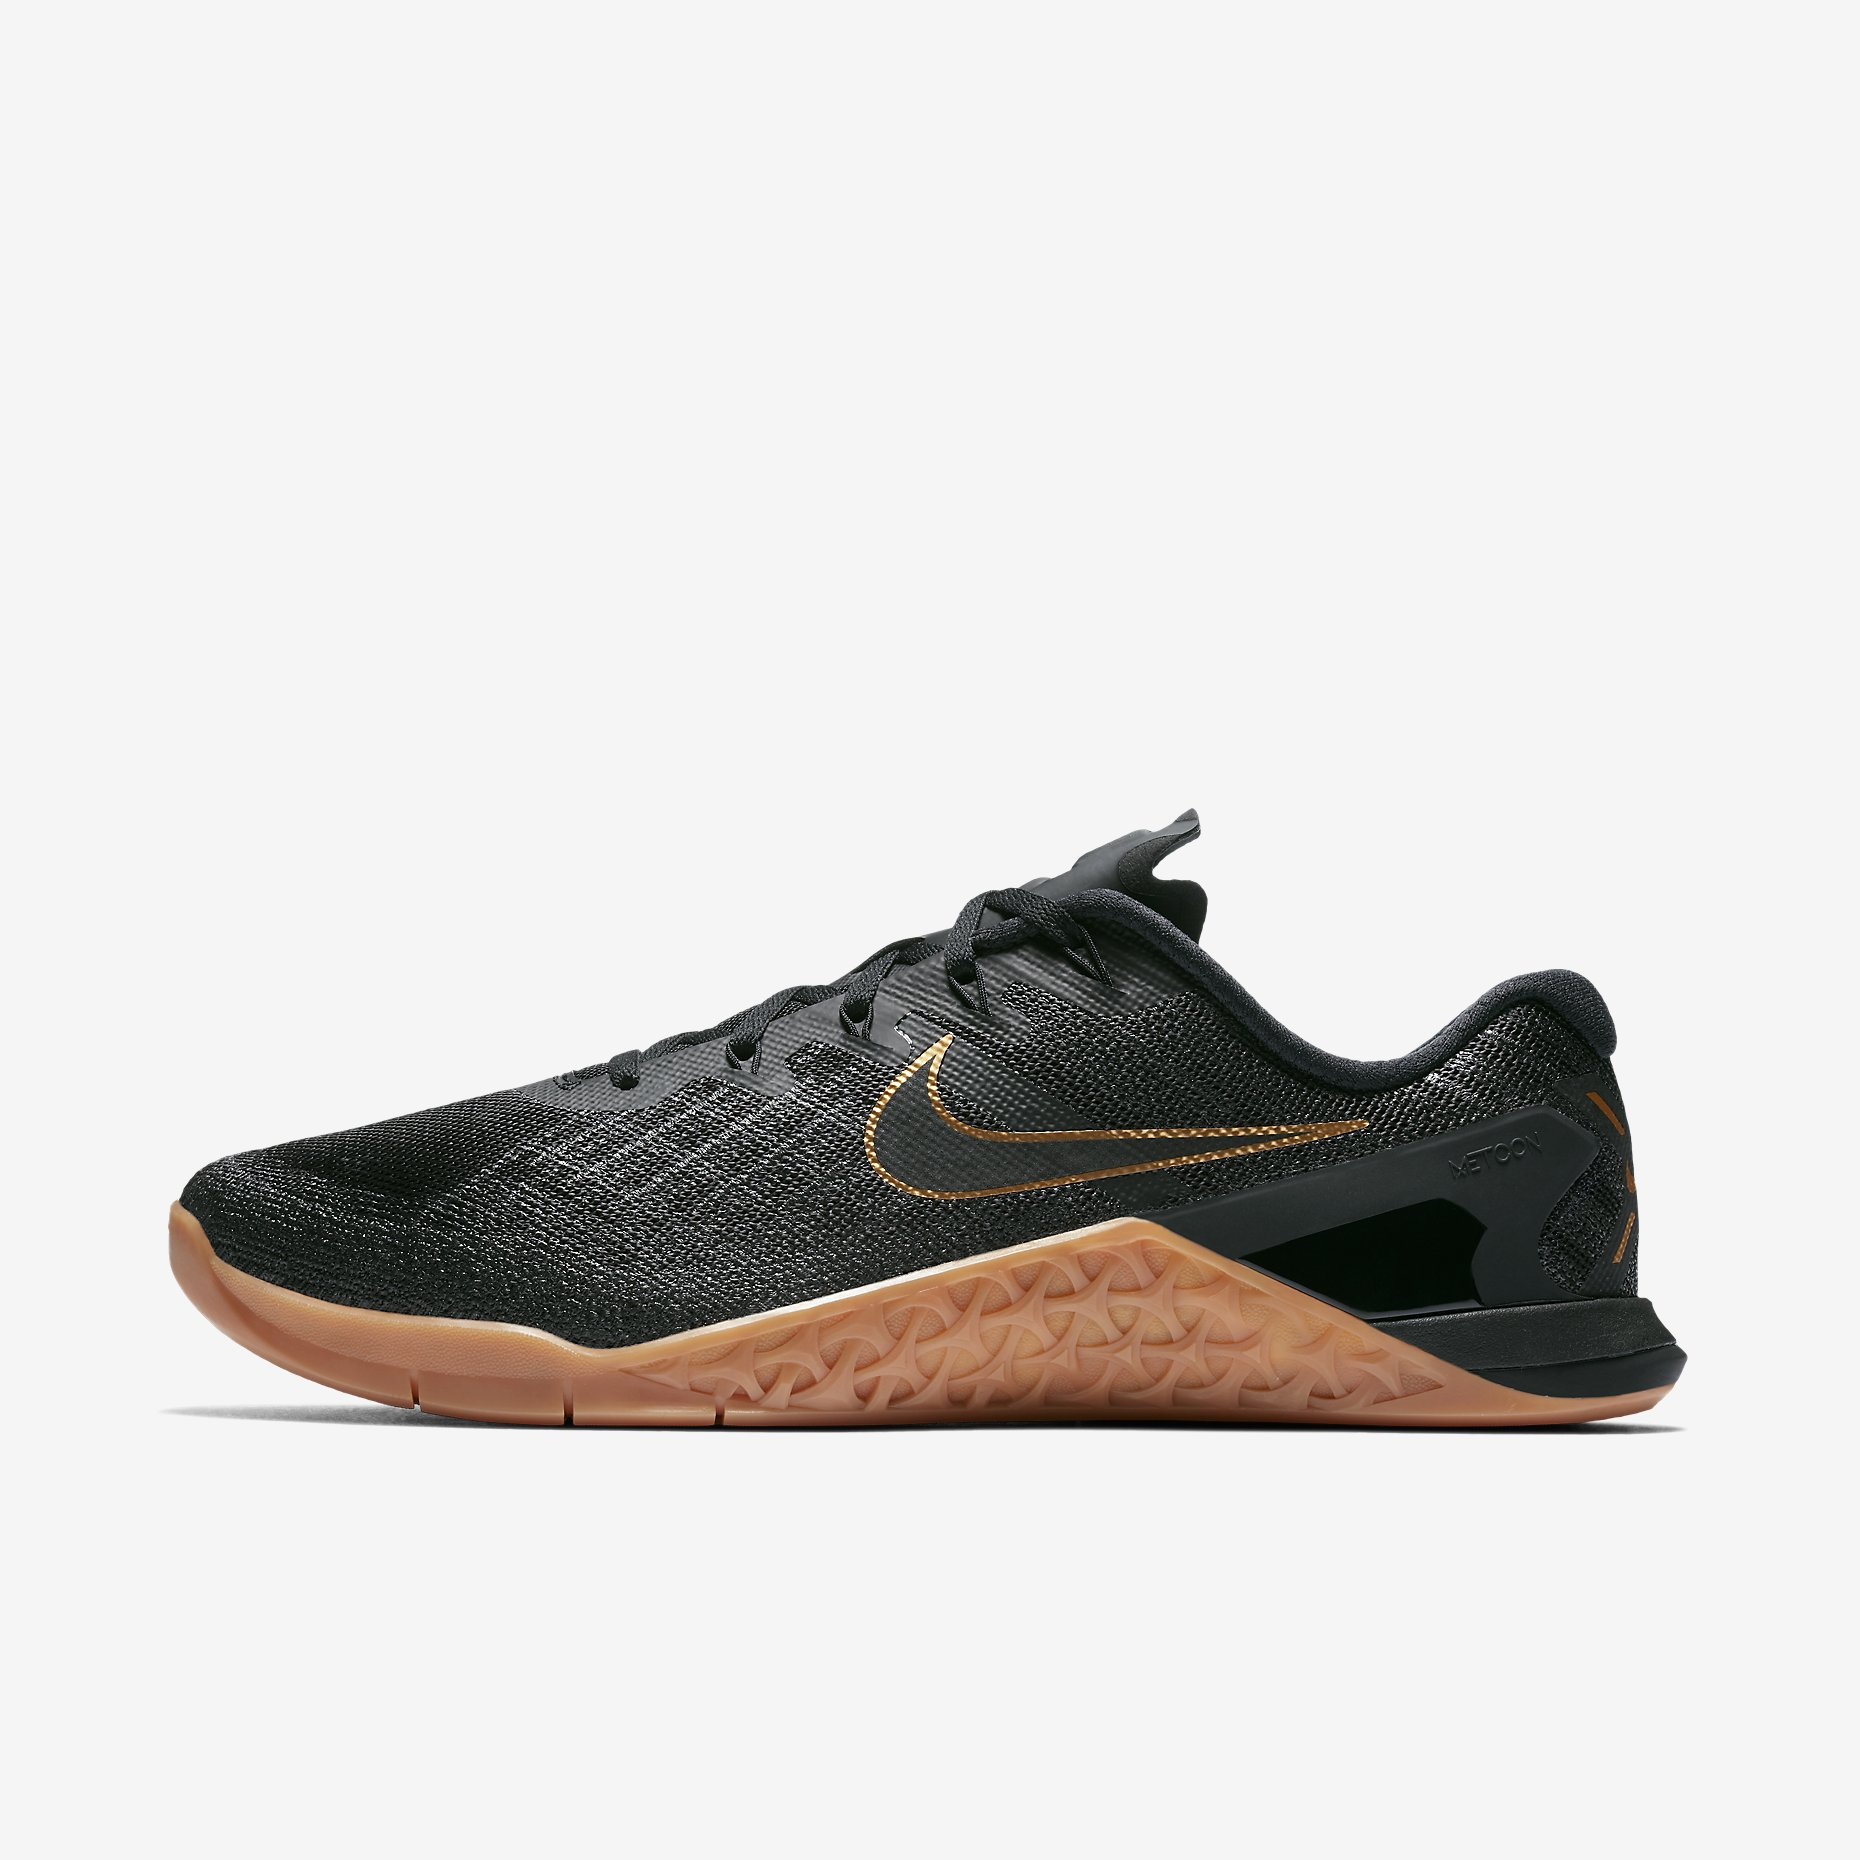 metcon-3-x-mens-training-shoe